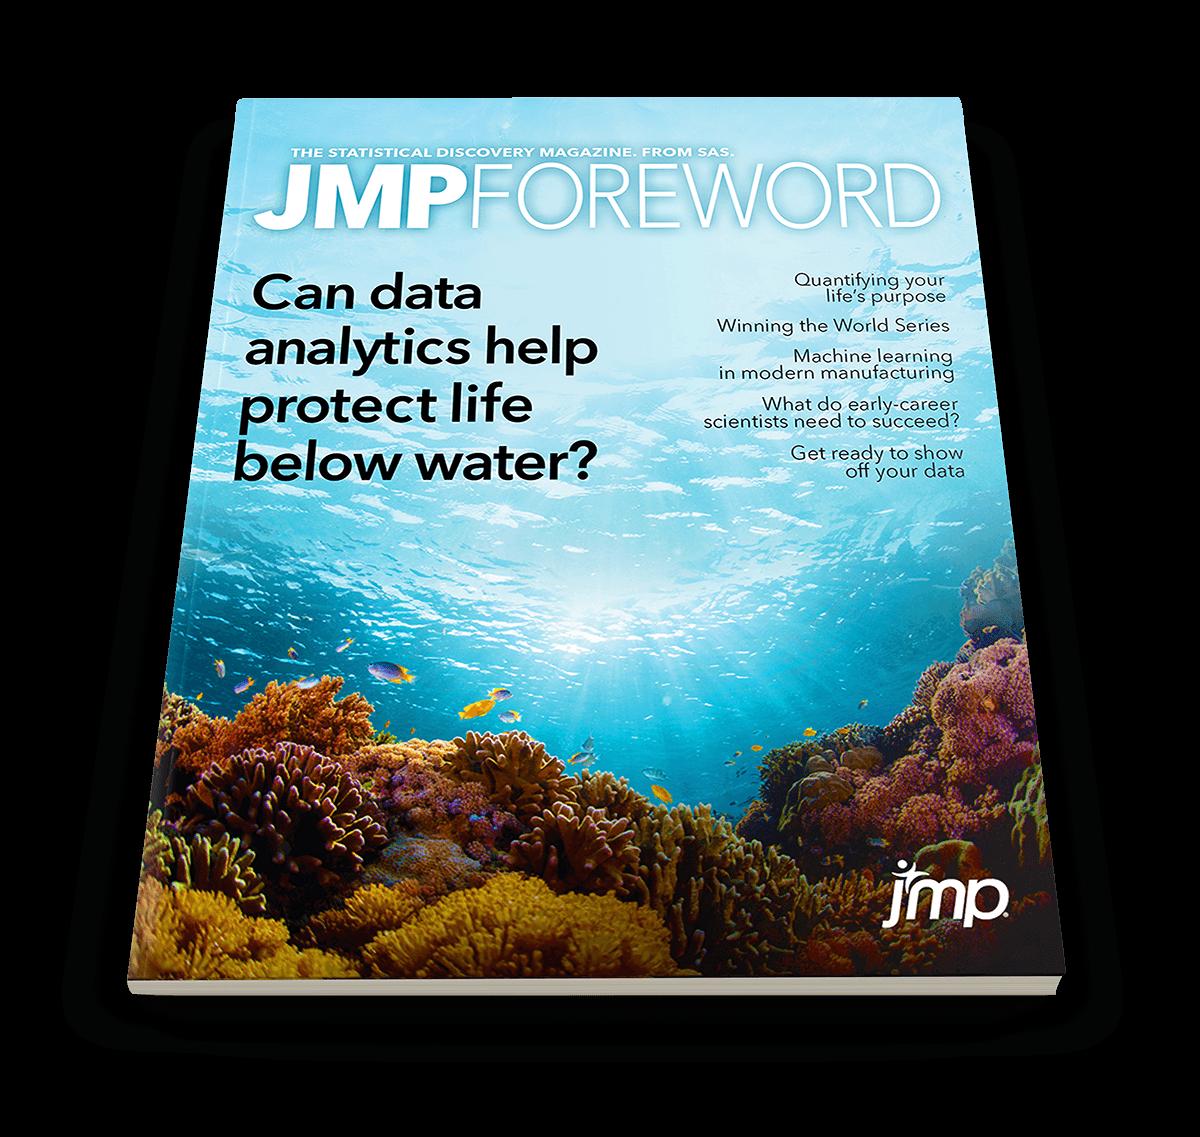 JMP Foreword Magazine